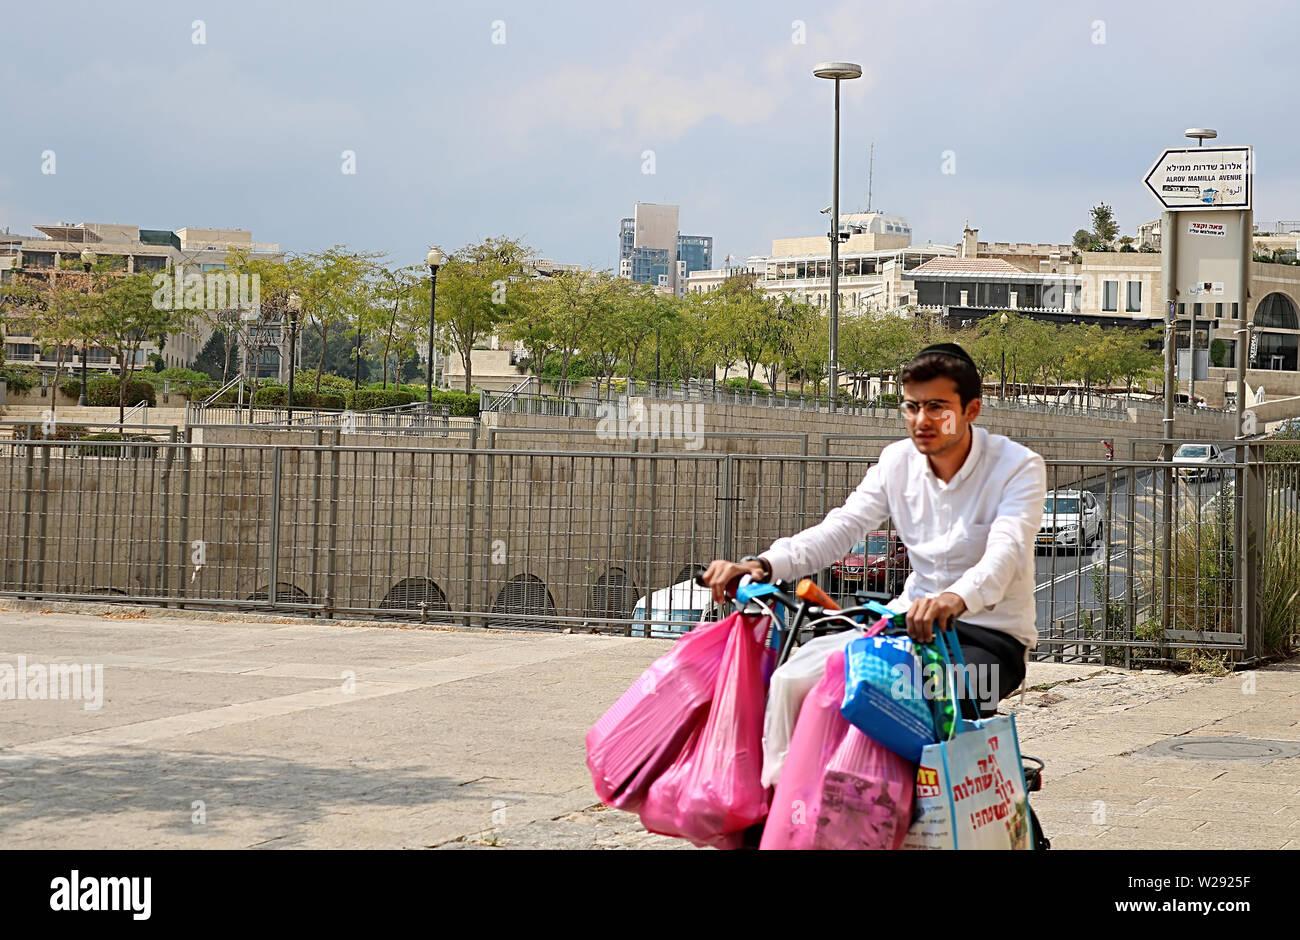 JERUSALEM, ISRAEL - SEPTEMBER 20, 2017: Unidentified boy on the bicycle on the street of Jerusalem - Stock Image